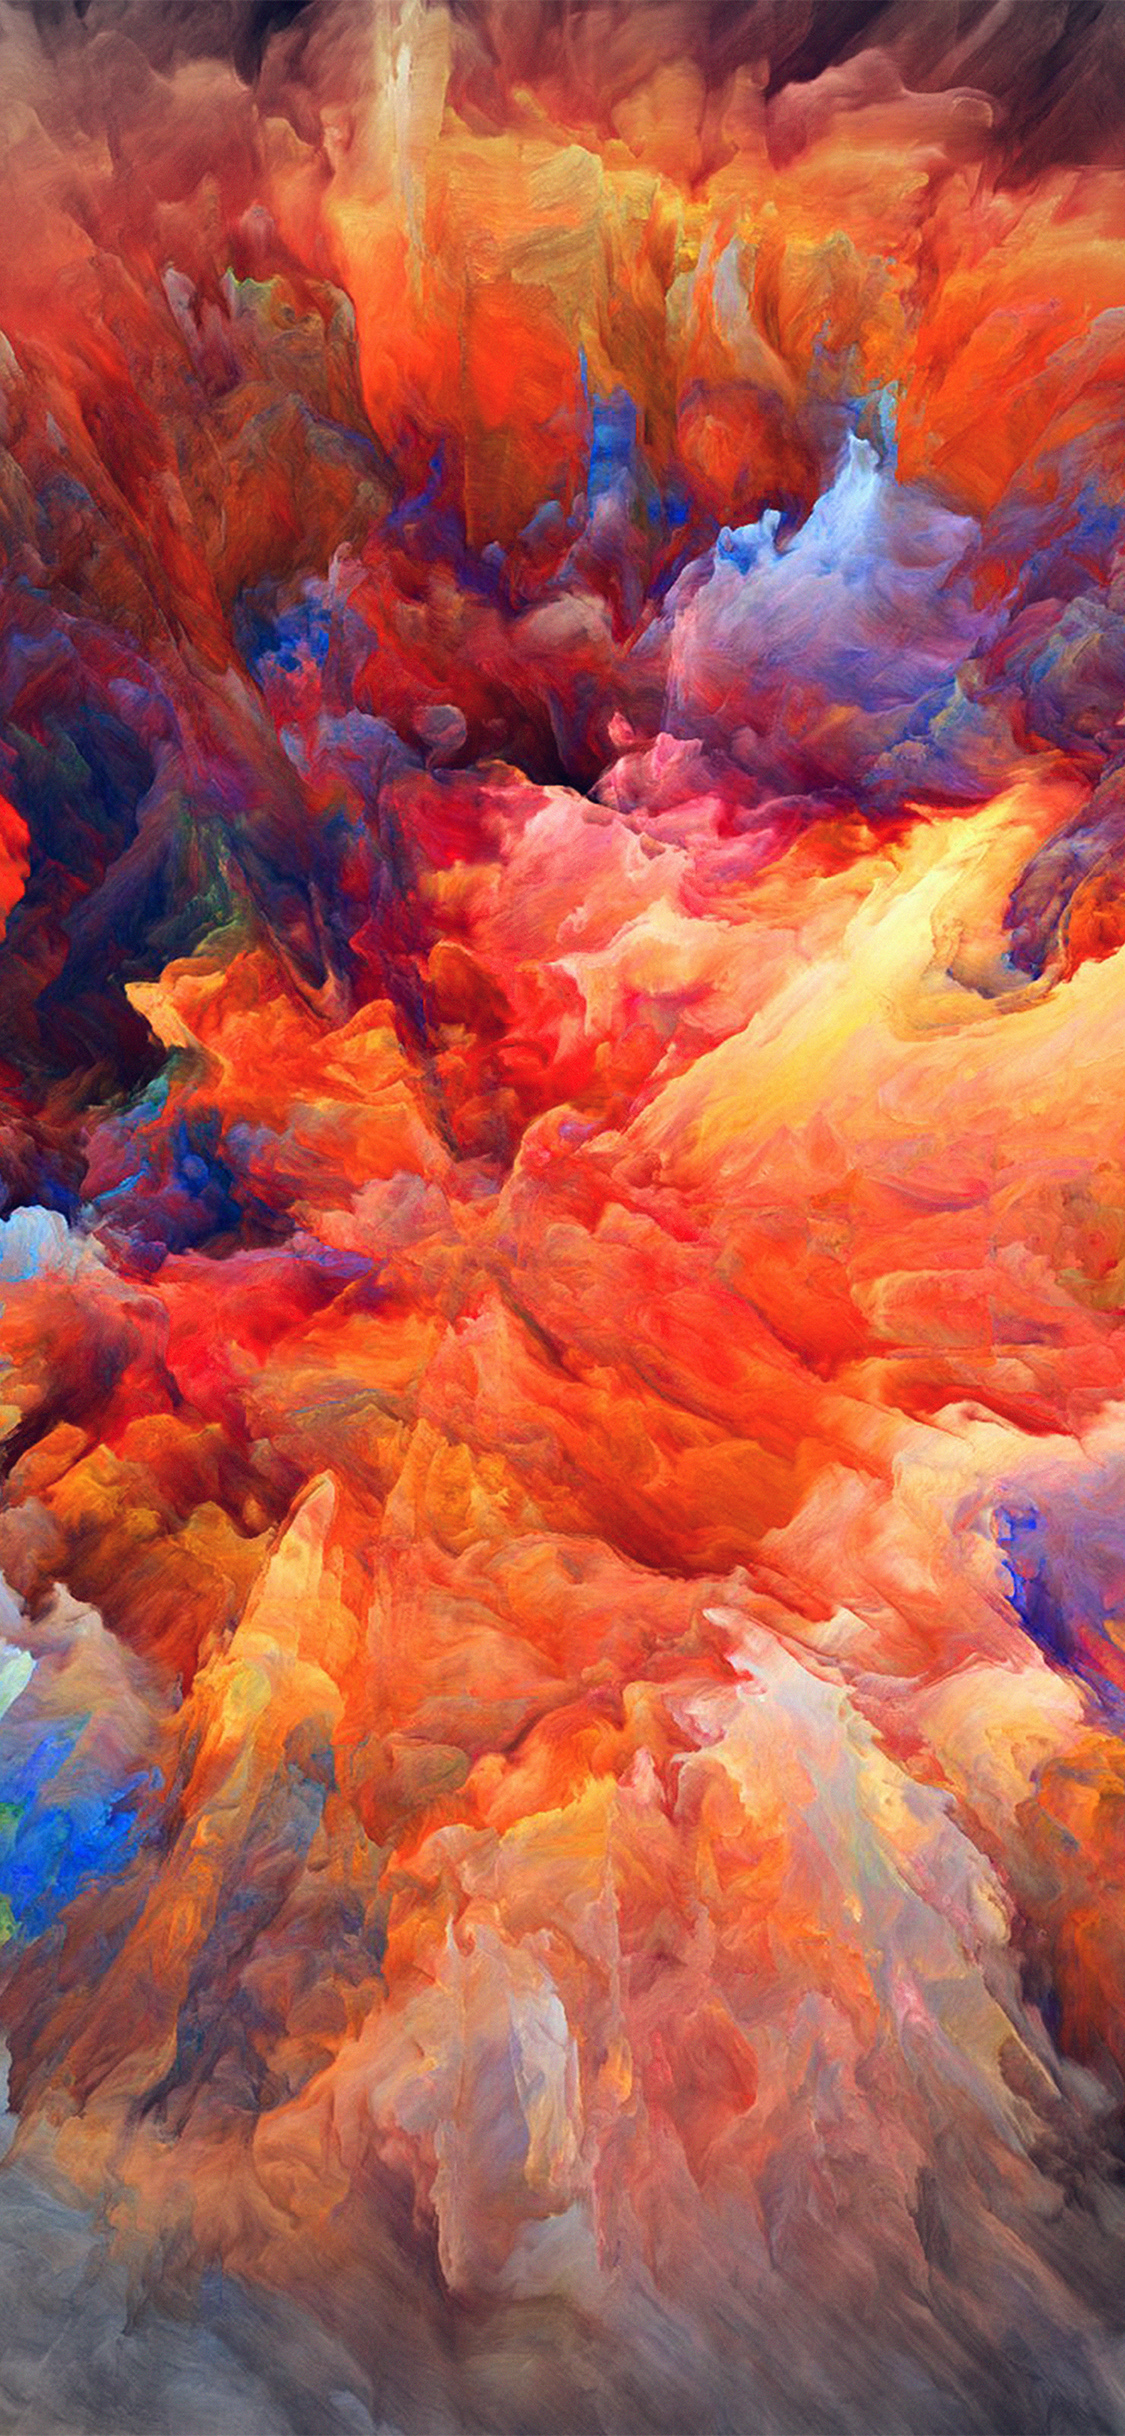 Colorful Film Texture Background Vintage